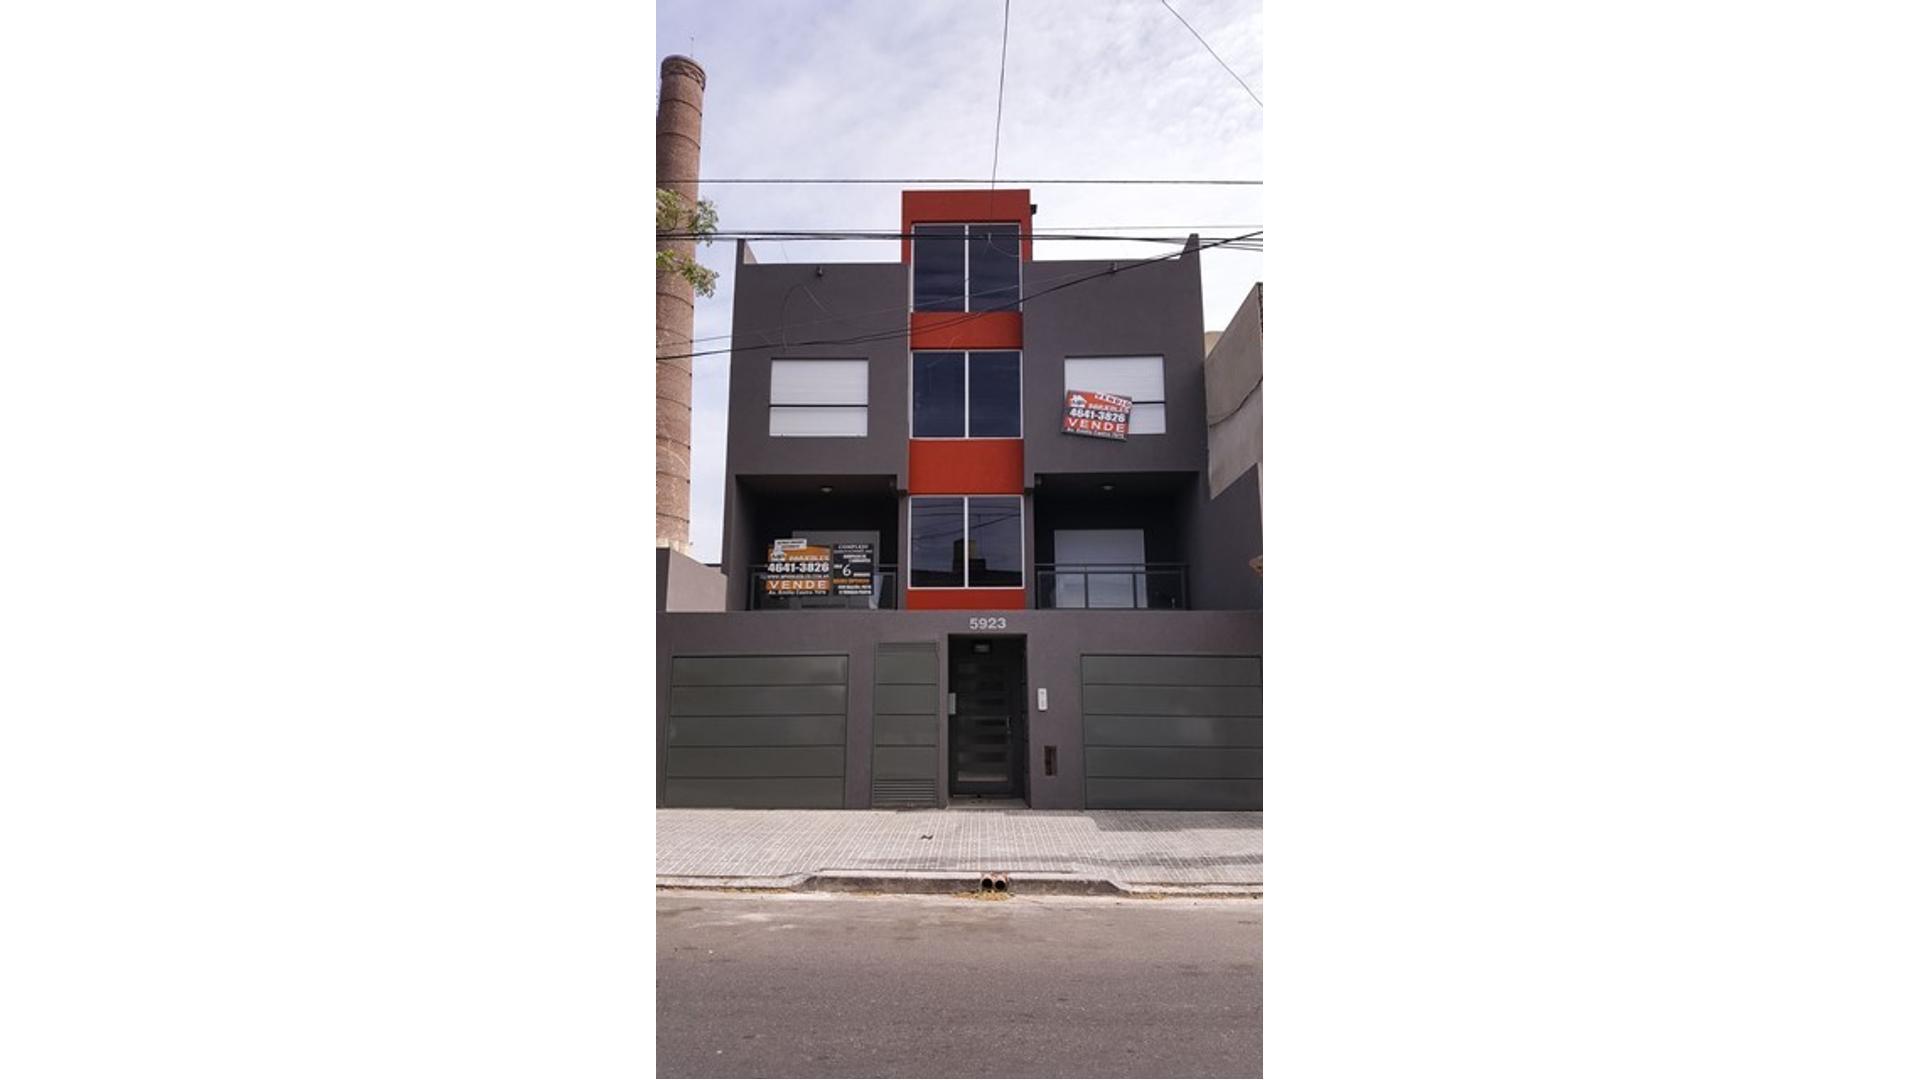 Departamento - Venta - Argentina, Capital Federal - SCHMIDEL, ULRICO  AL 5900